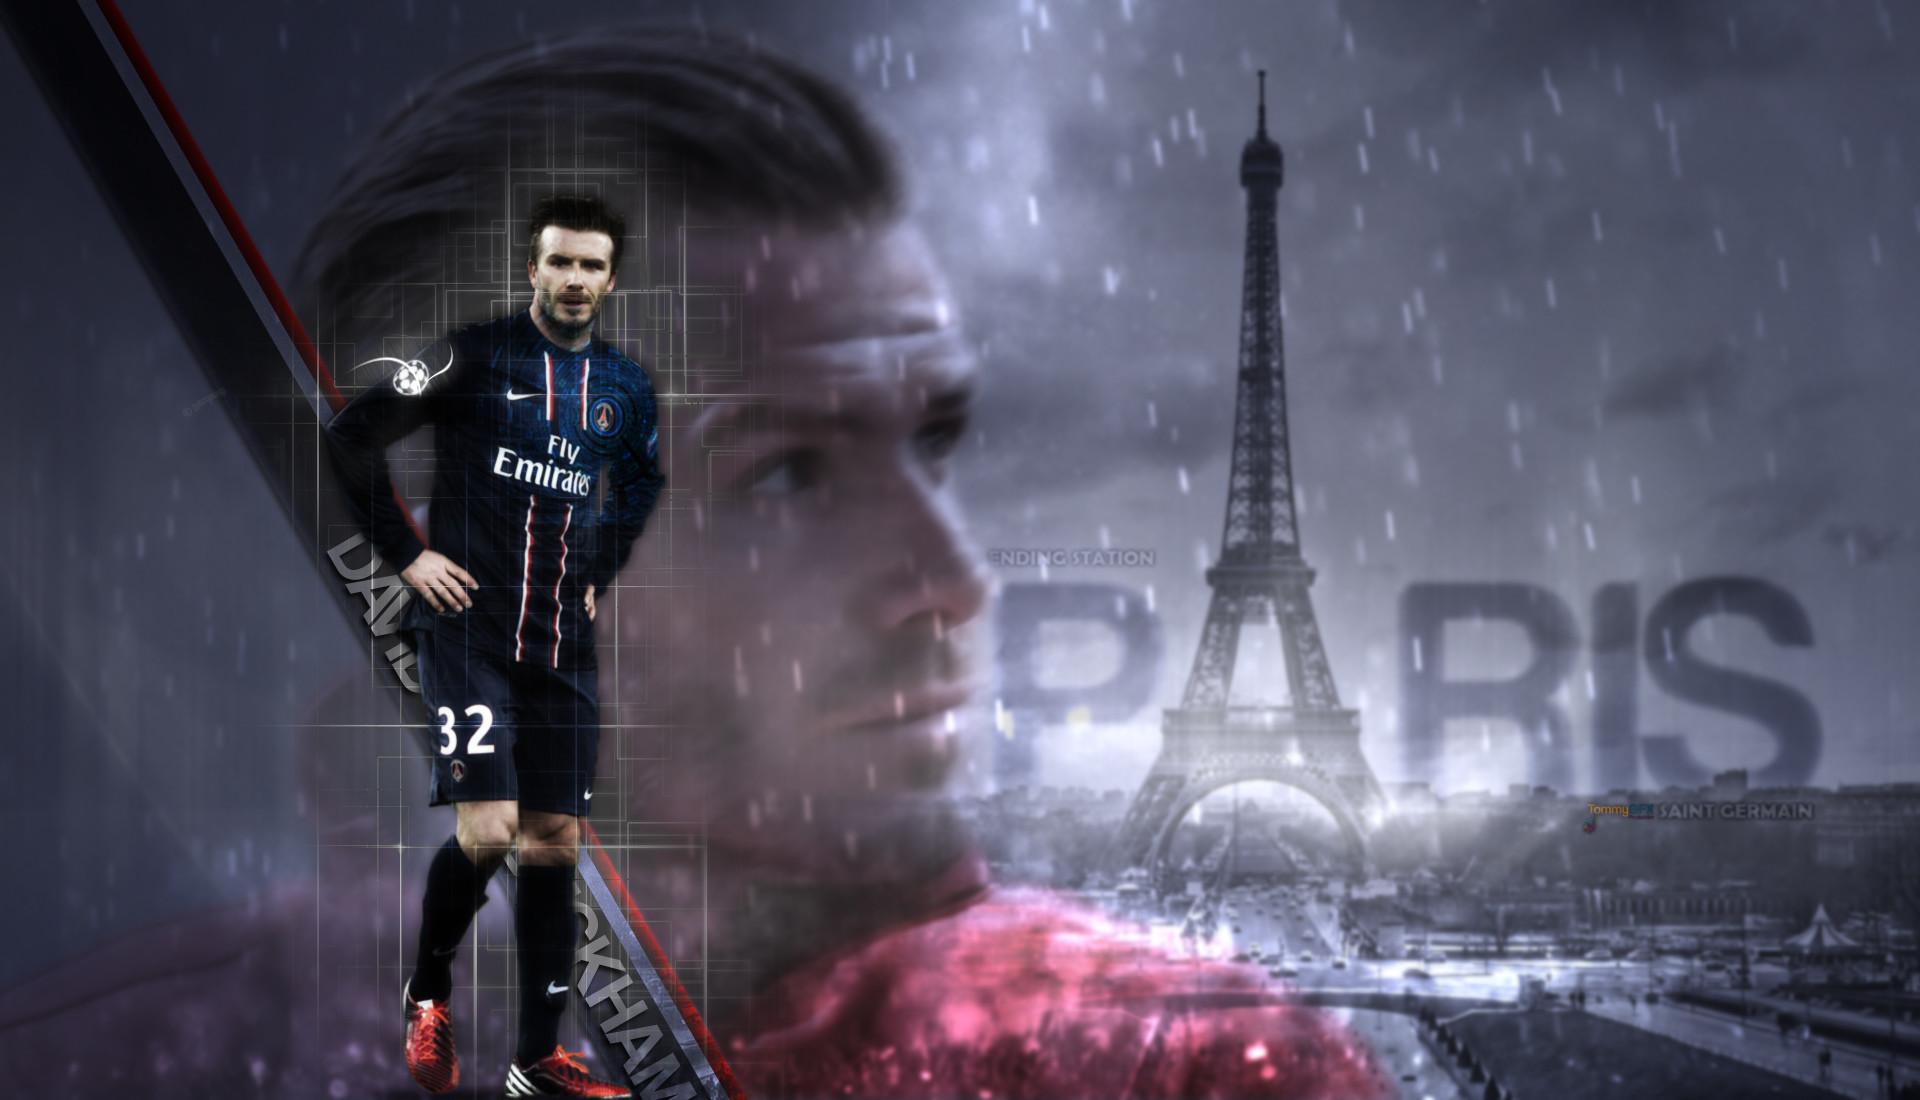 Res: 1920x1100, David Beckham